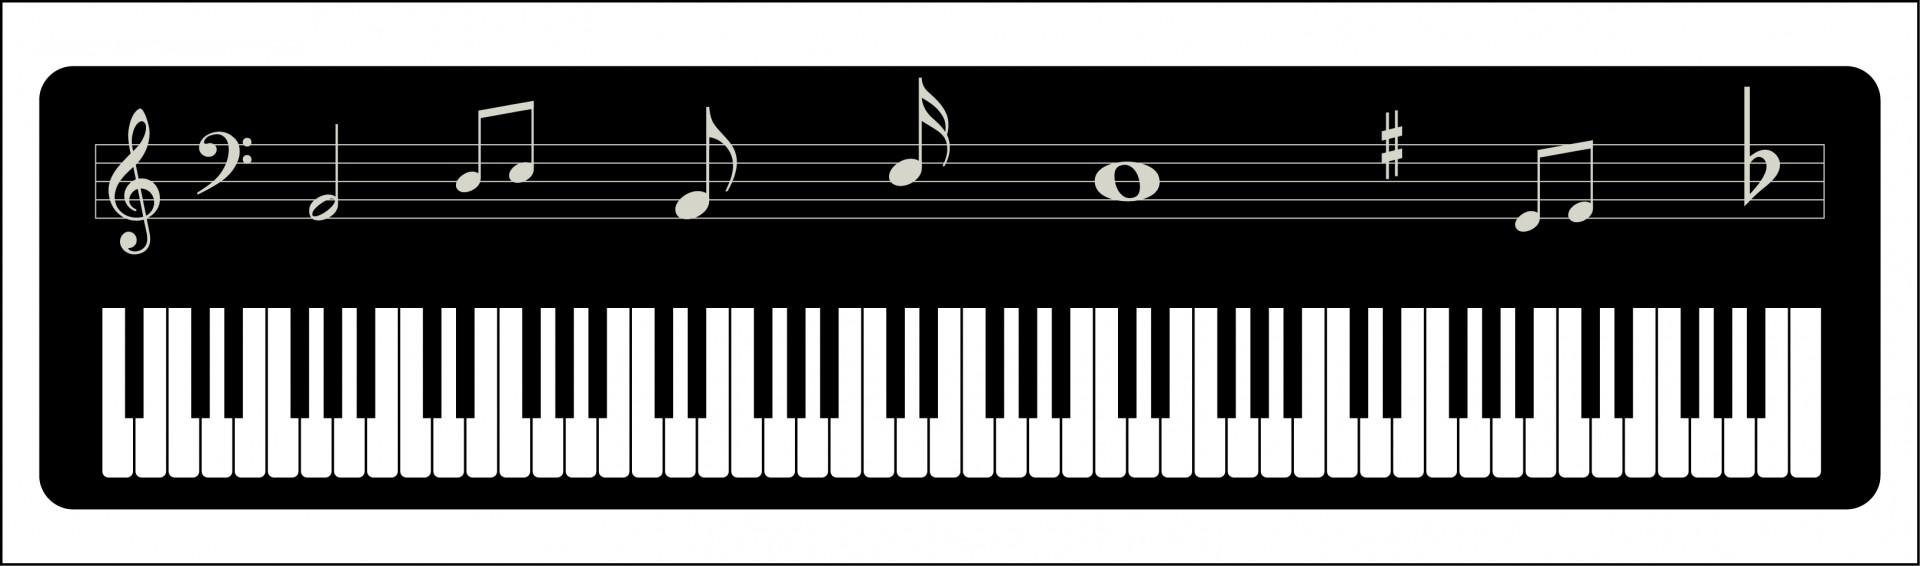 Musician clipart piano notes Public Piano Pictures Musical Piano